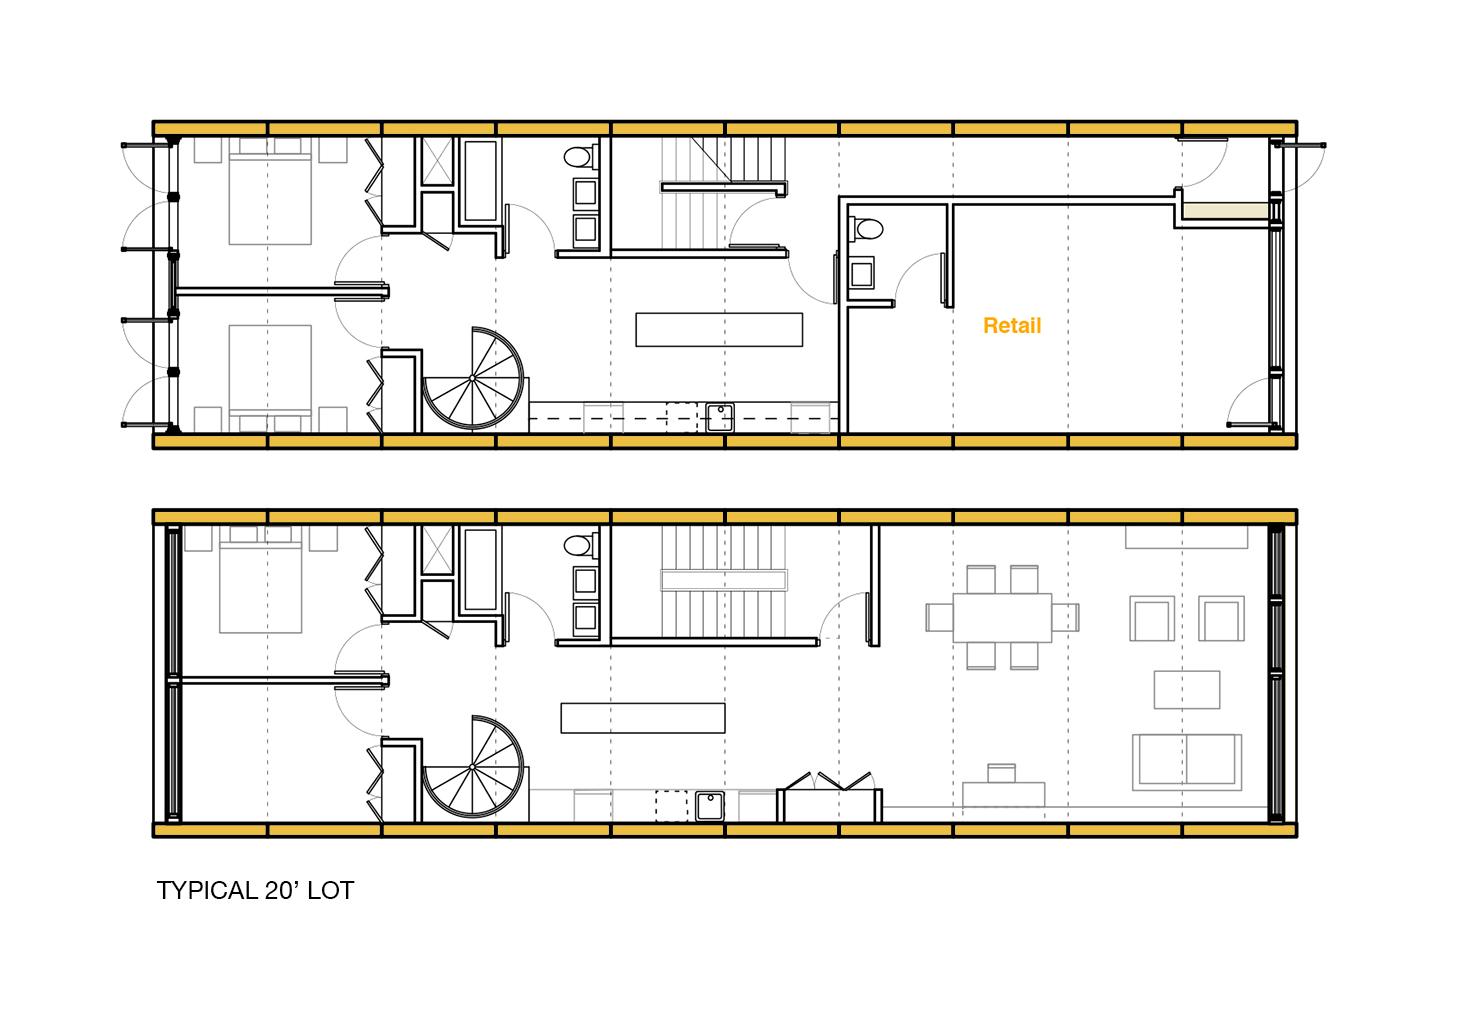 Townhouse Plan 2.jpg